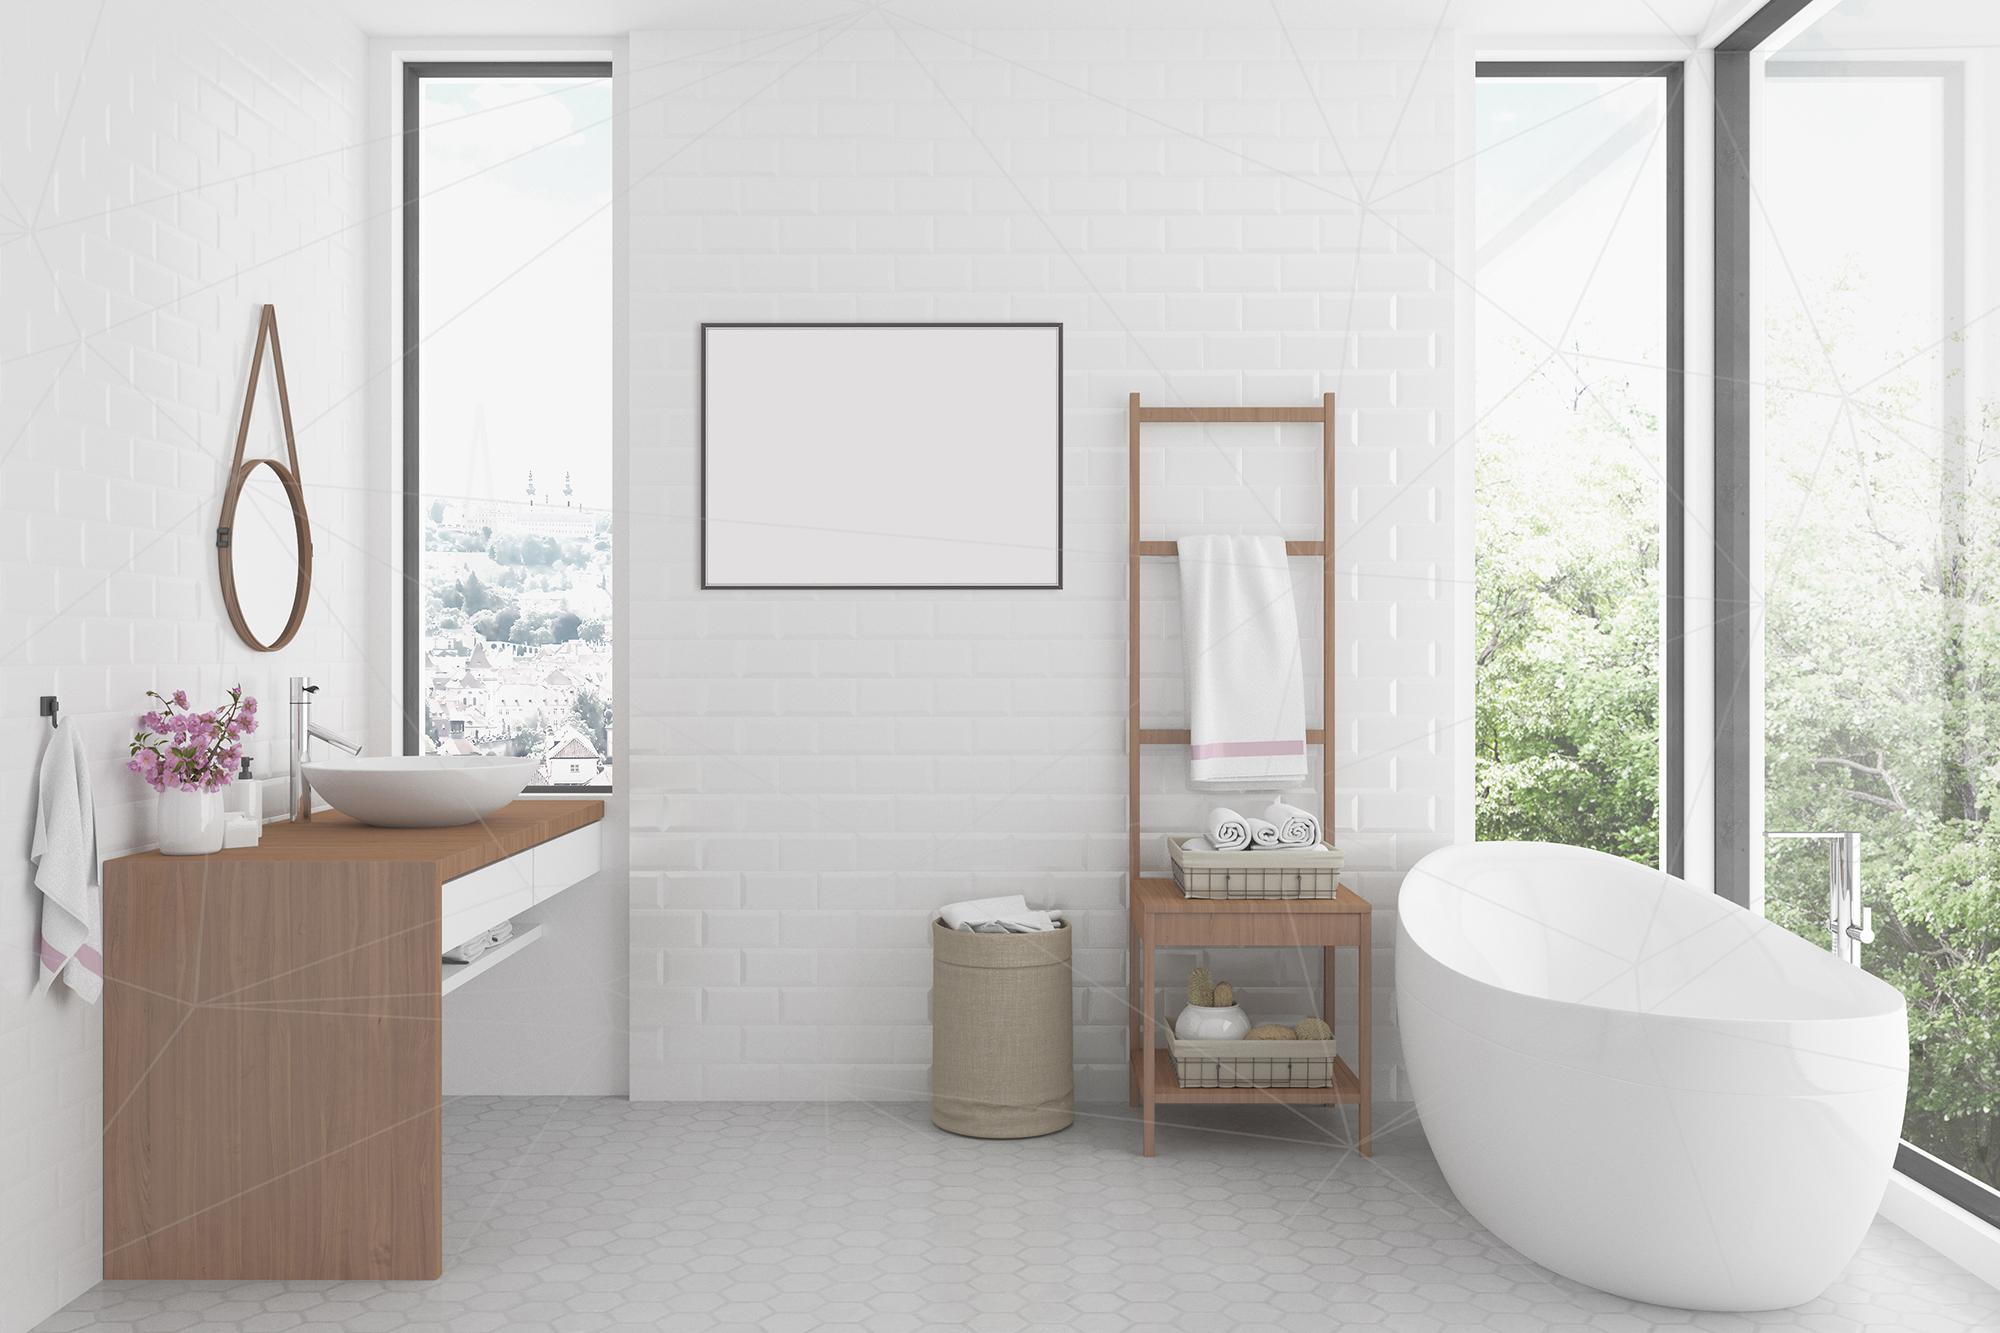 Interior mockup bundle - bathroom background example image 3